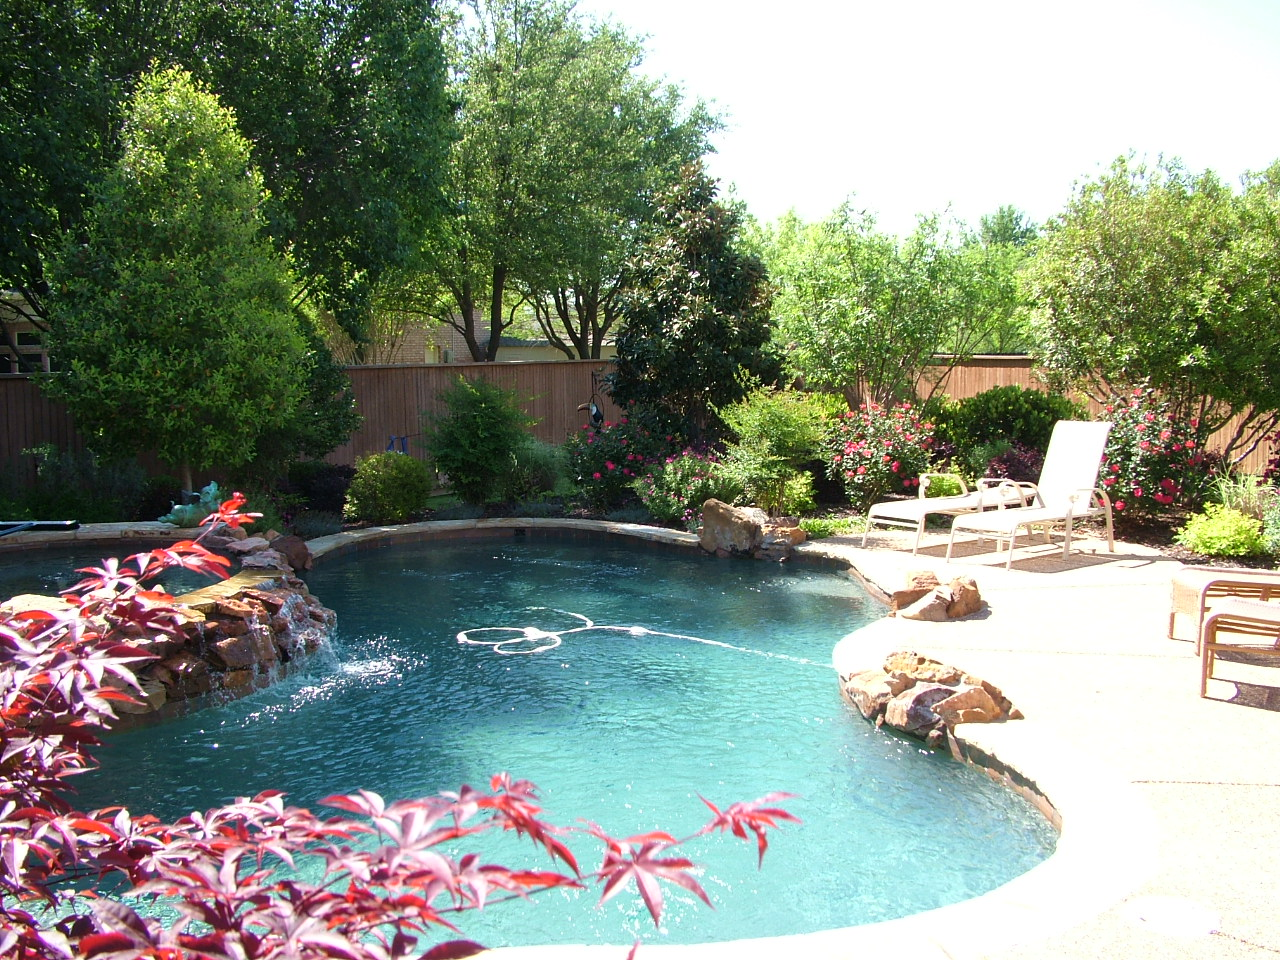 Steele landscapes patios keller tx 76248 angies list for Landscape gardeners poole